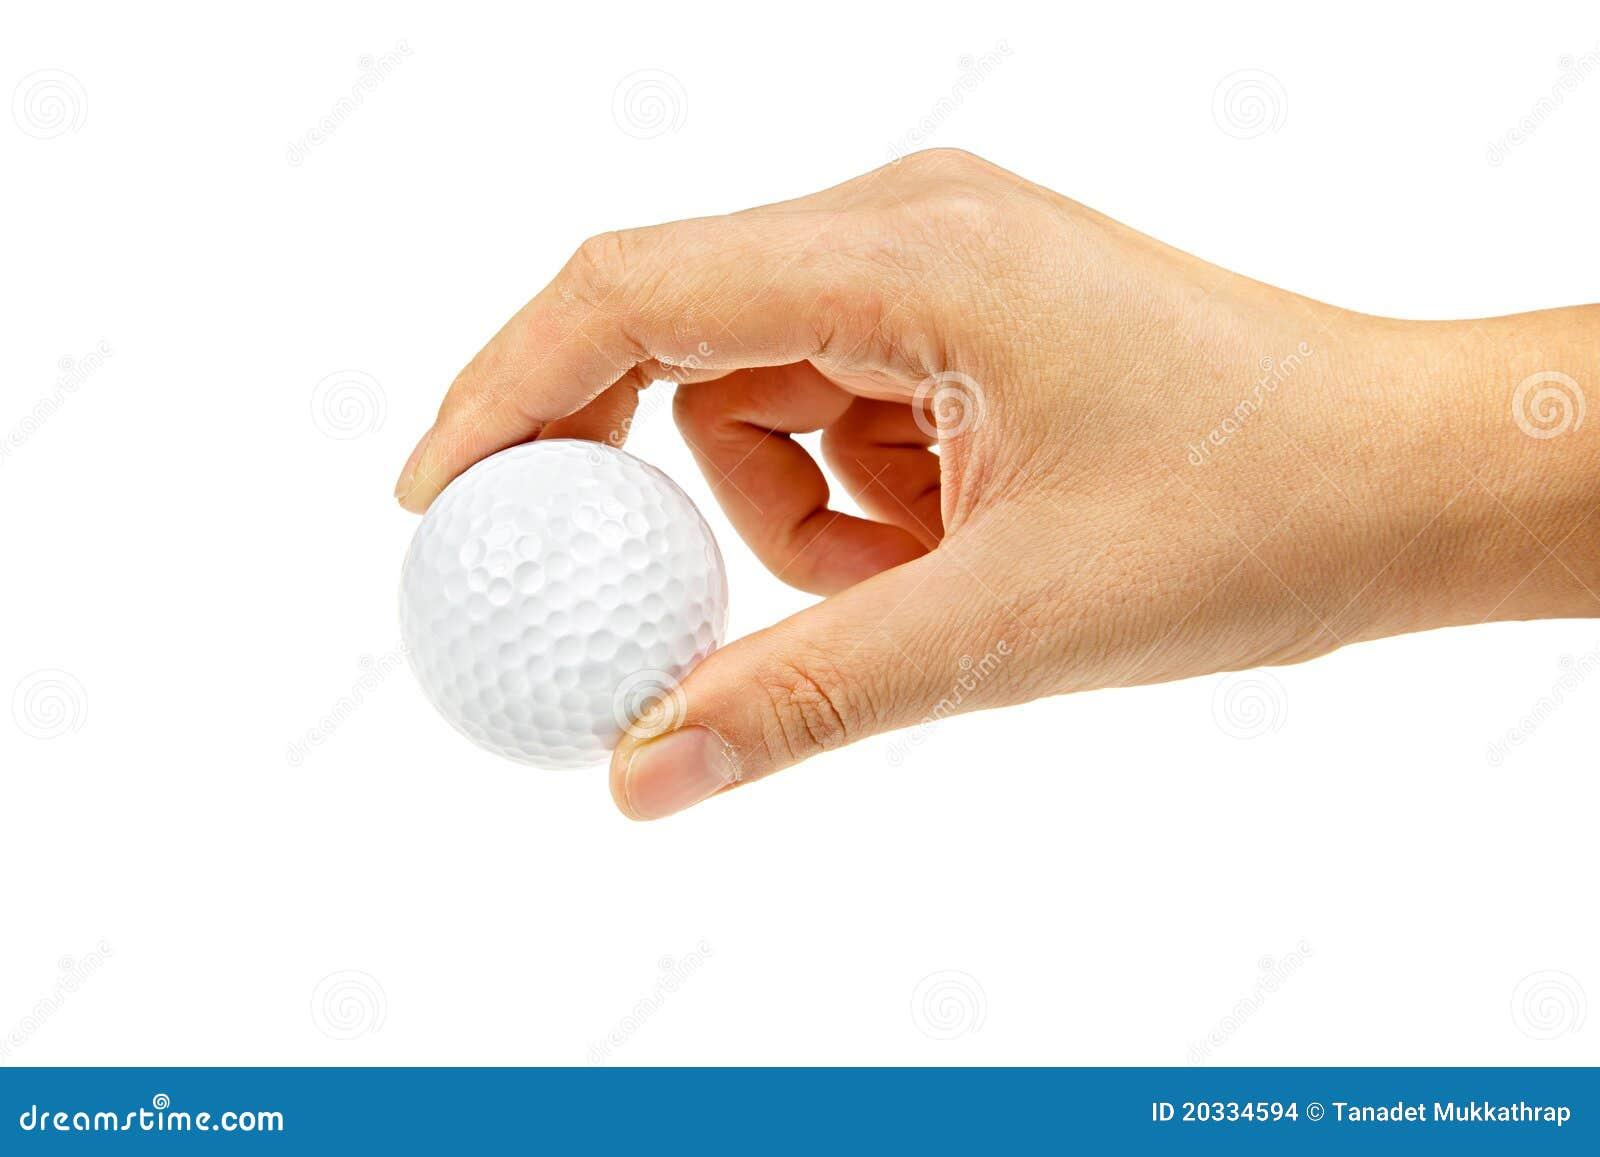 Female Hand Holding Golf Ball Stock Images - Image: 20334594